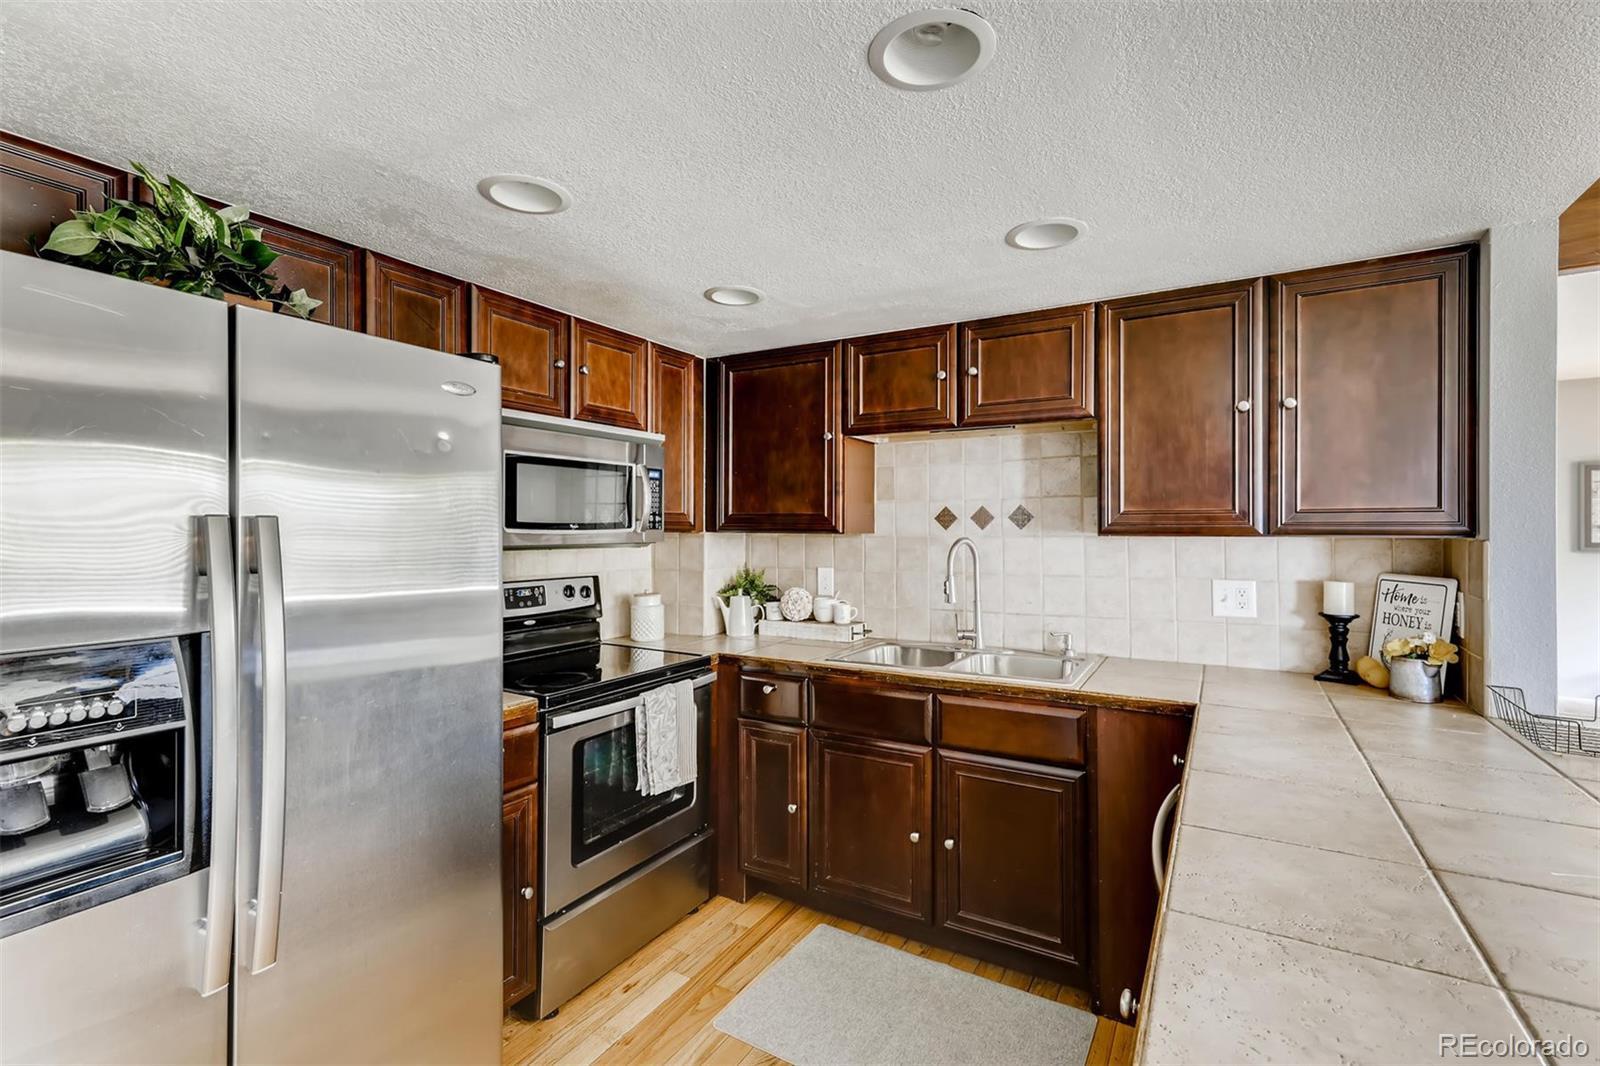 MLS# 7445656 - 12 - 1710 W 101st Avenue, Thornton, CO 80260